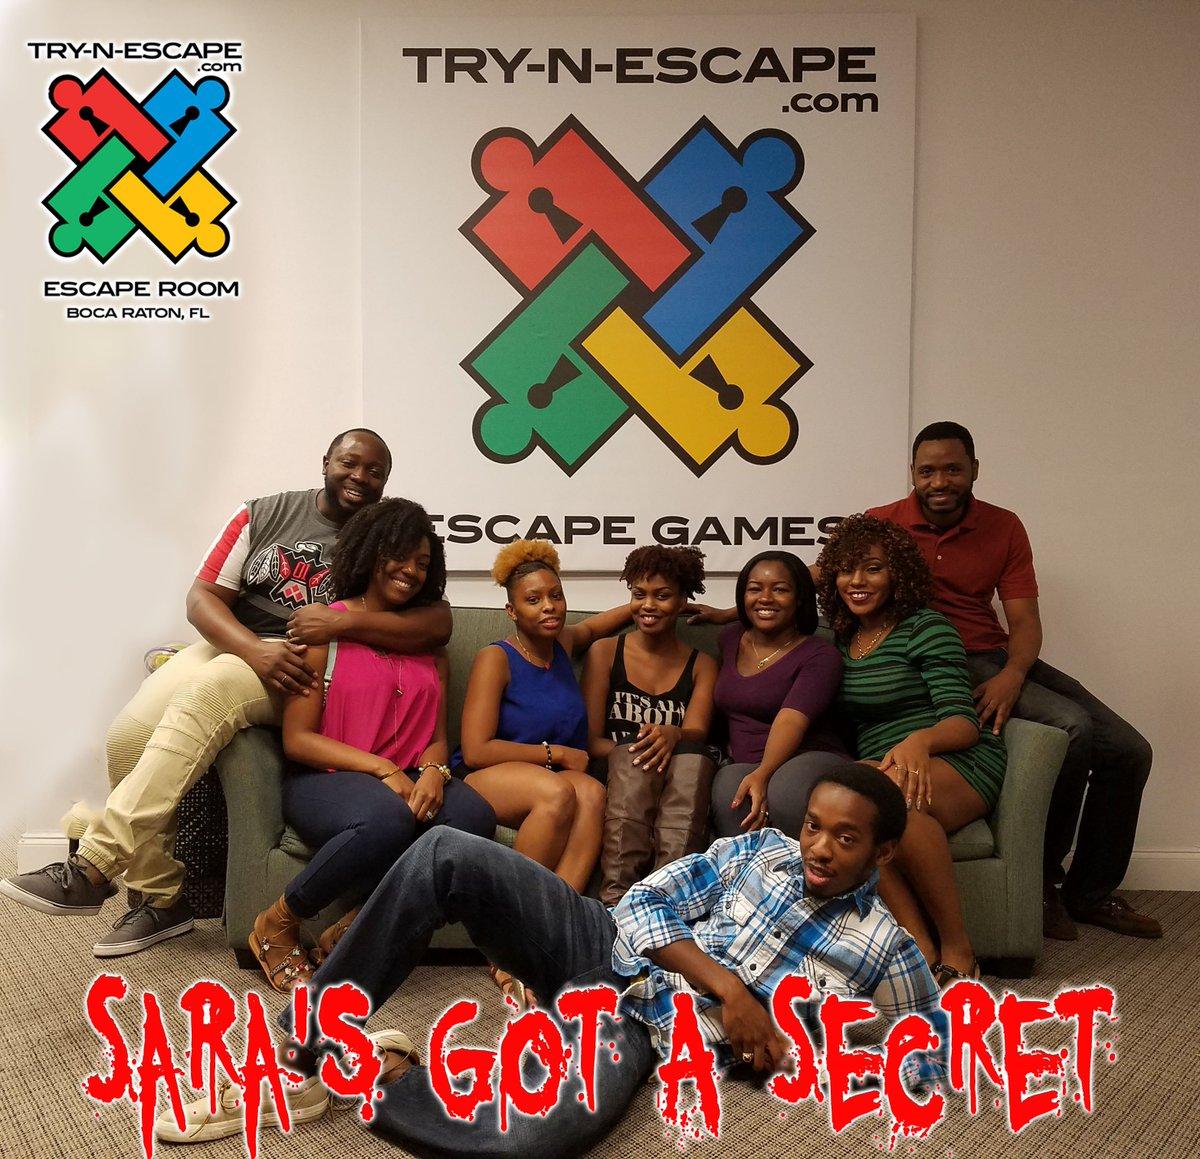 Escape Room Boca Raton >> Try N Escape Try N Escape Twitter